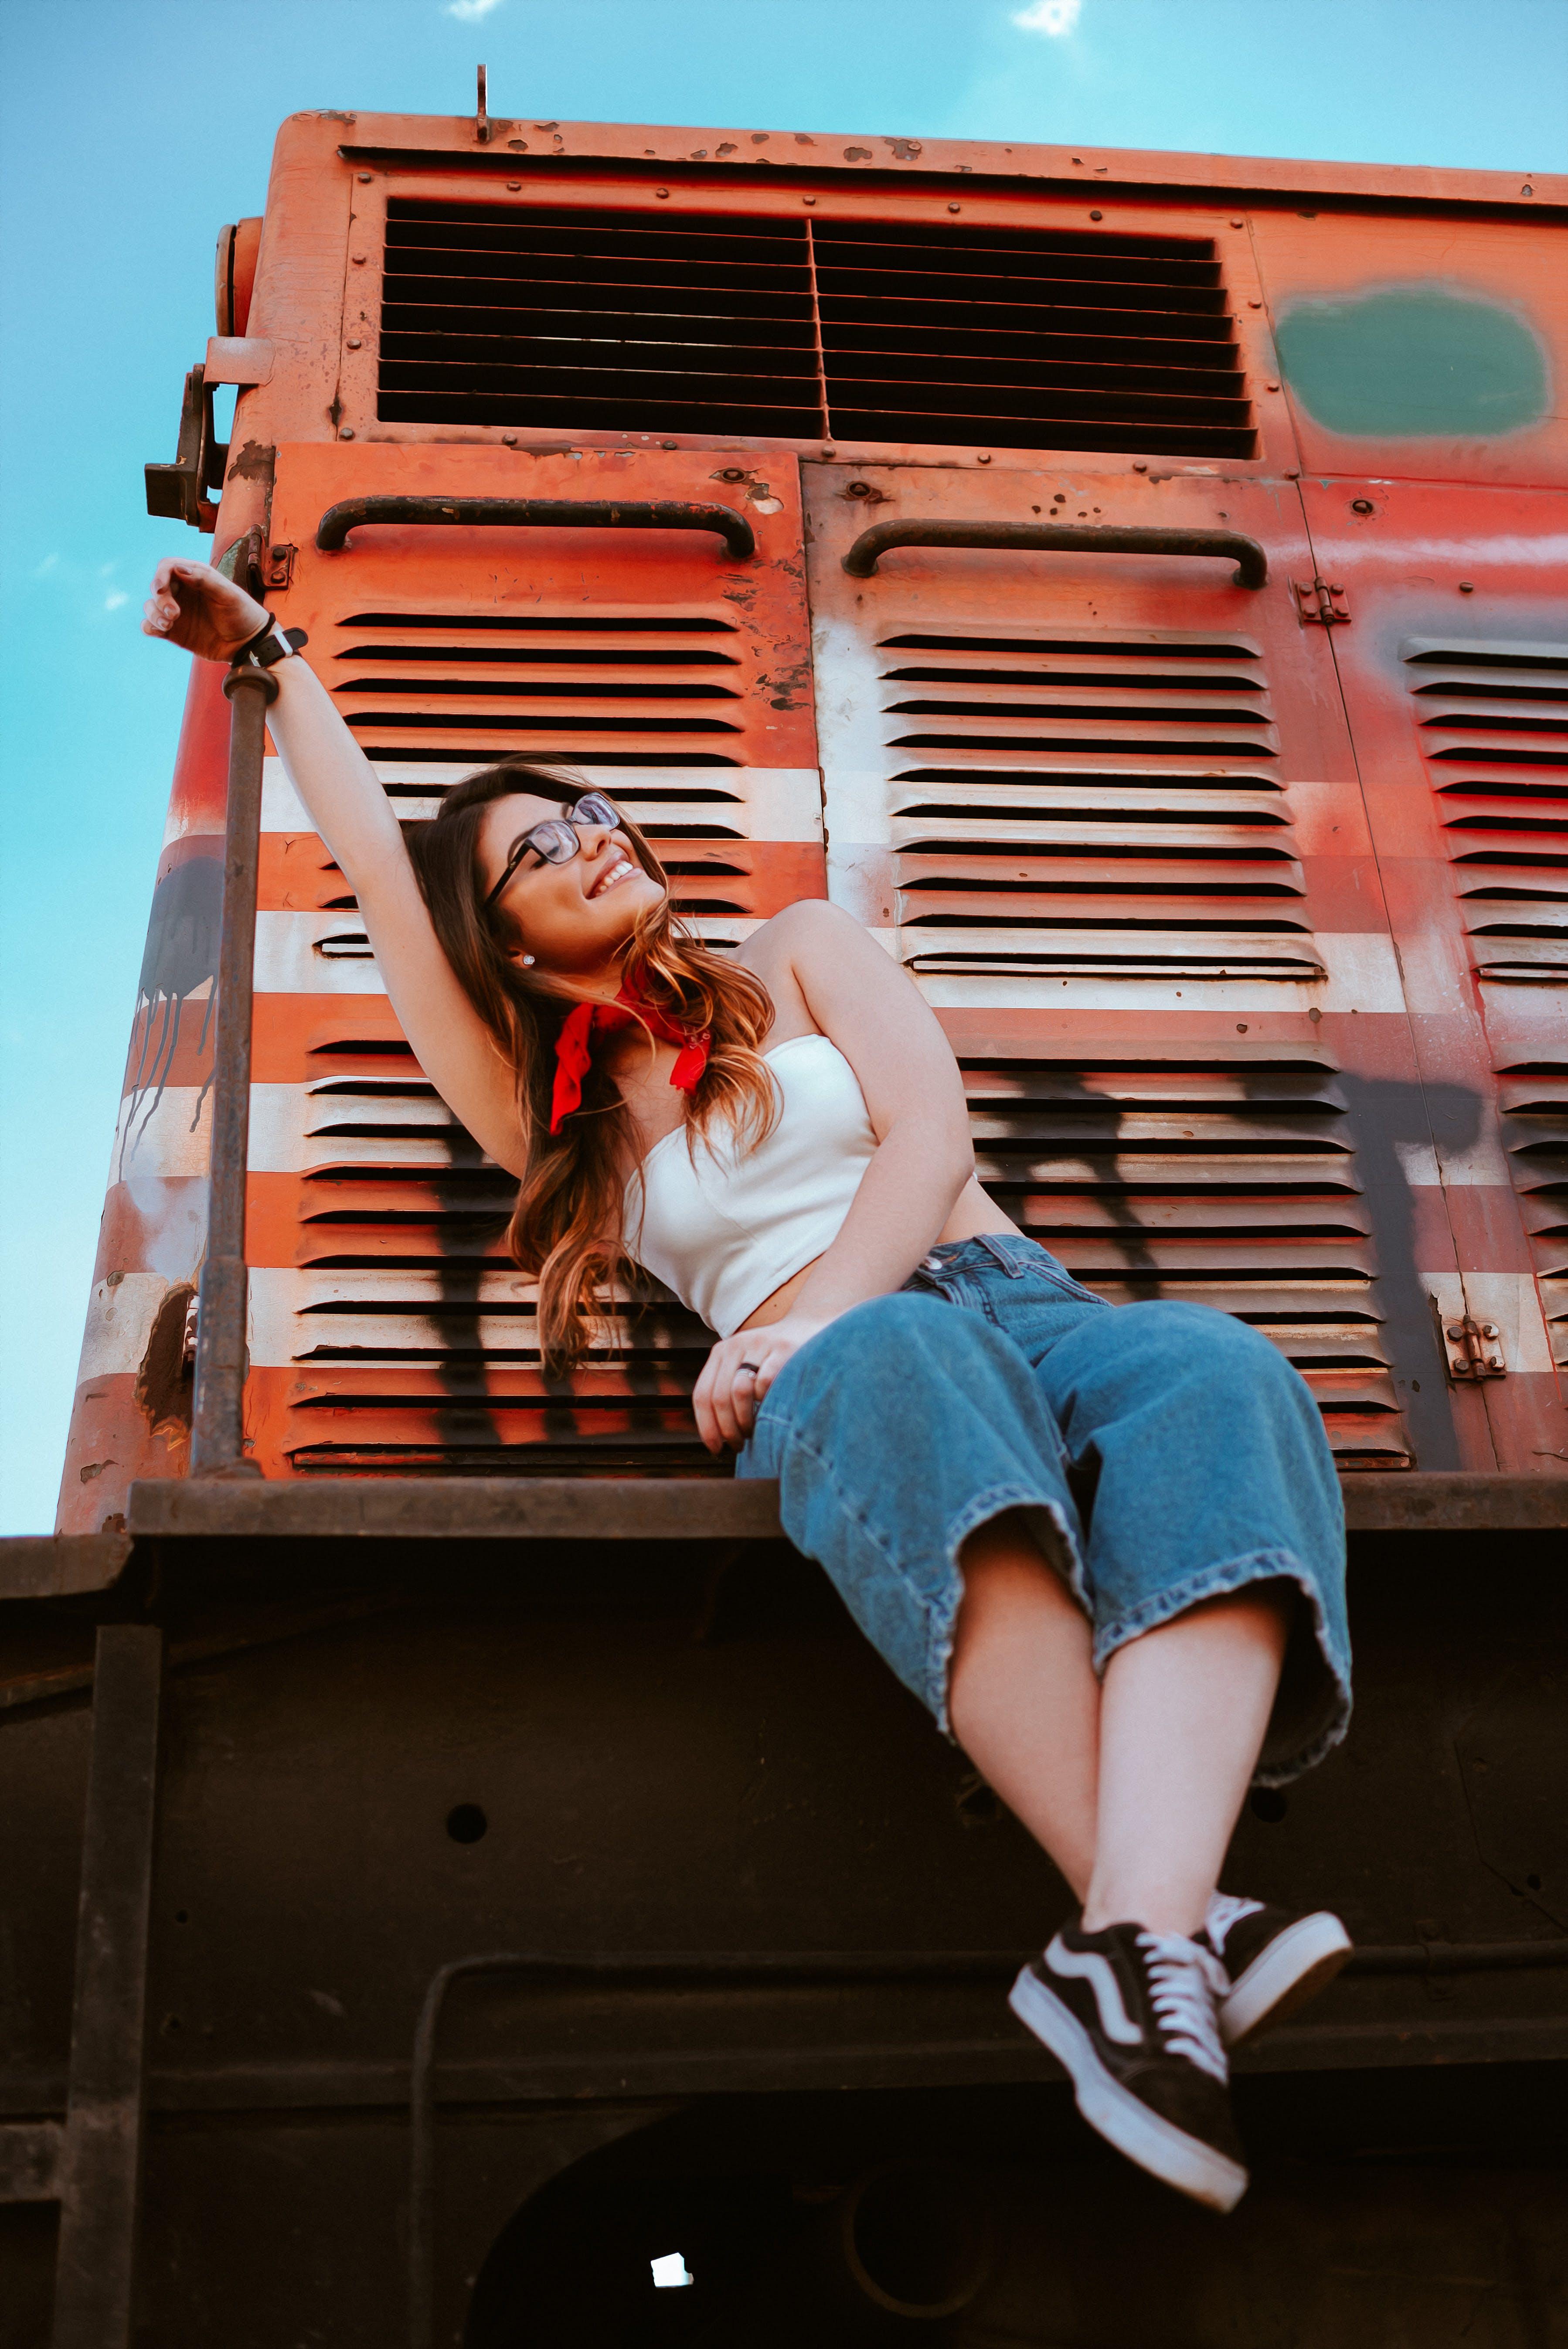 Woman Sitting on Orange and Gray Train Under Blue Sky